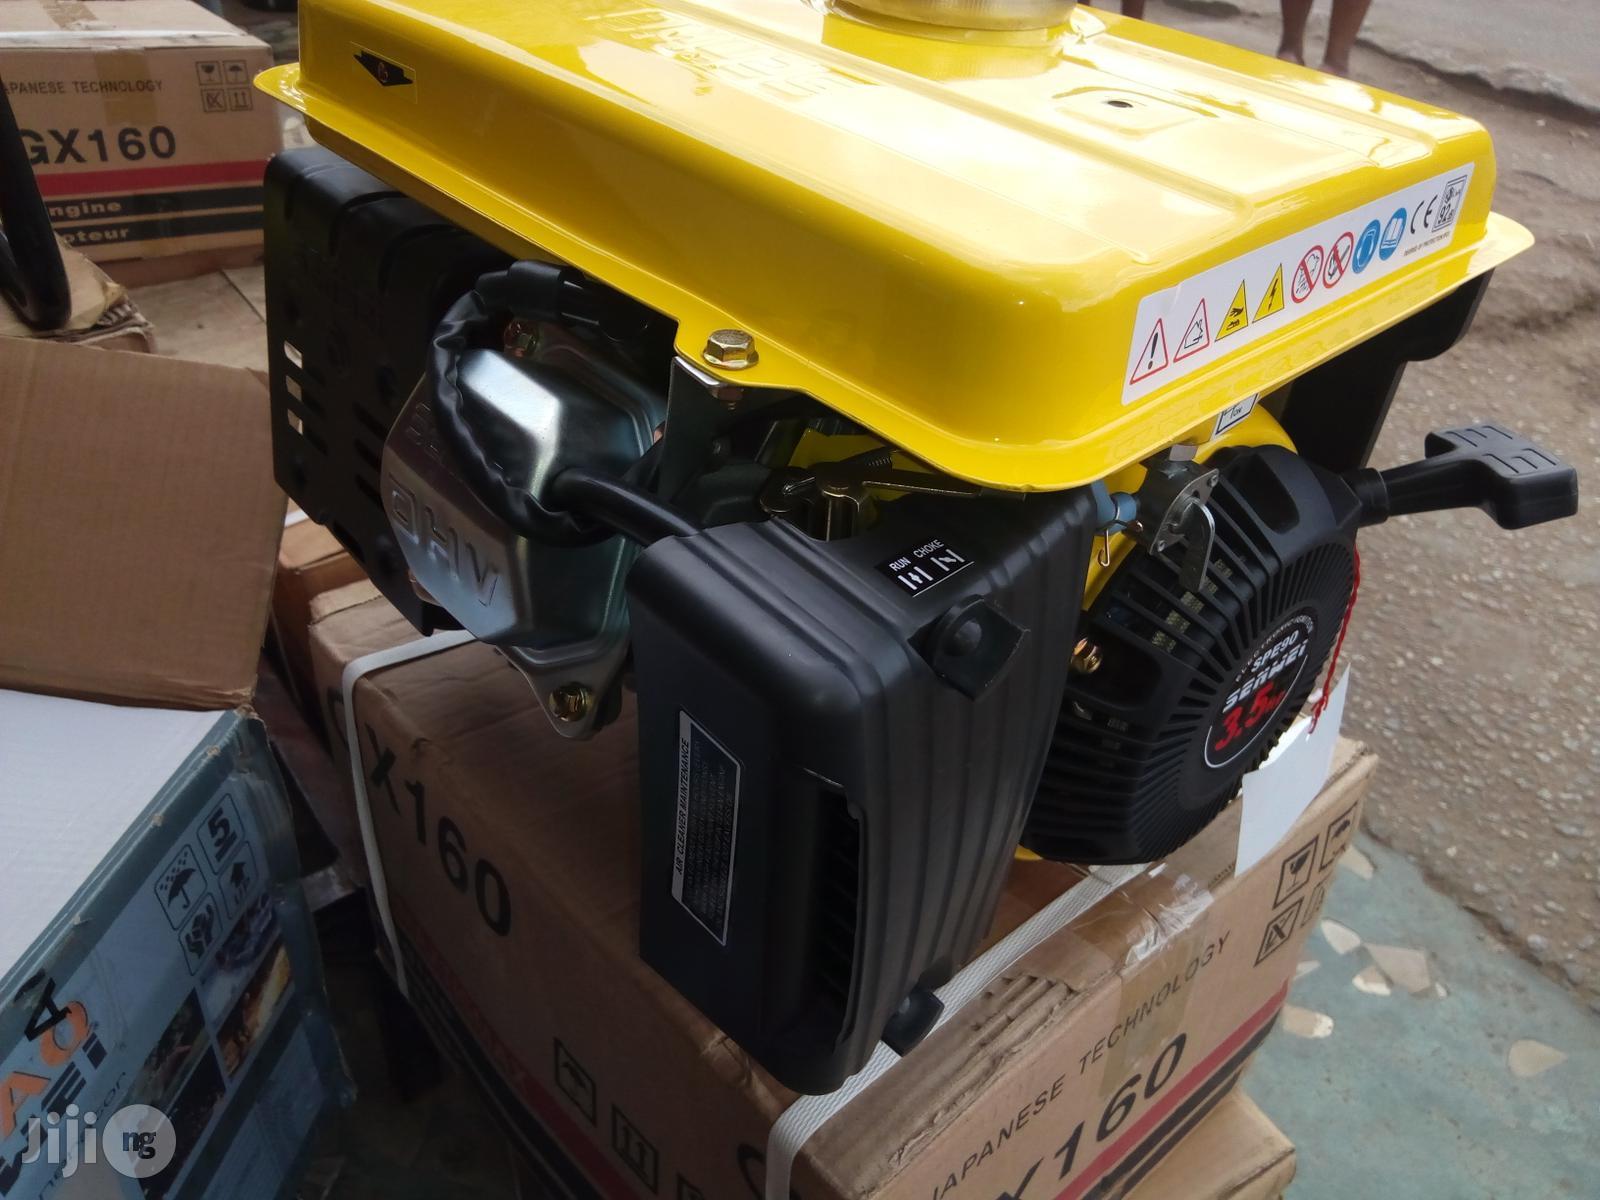 ELEPAQ Senwei Generator Model 1850 (1.1kva) | Electrical Equipment for sale in Agege, Lagos State, Nigeria